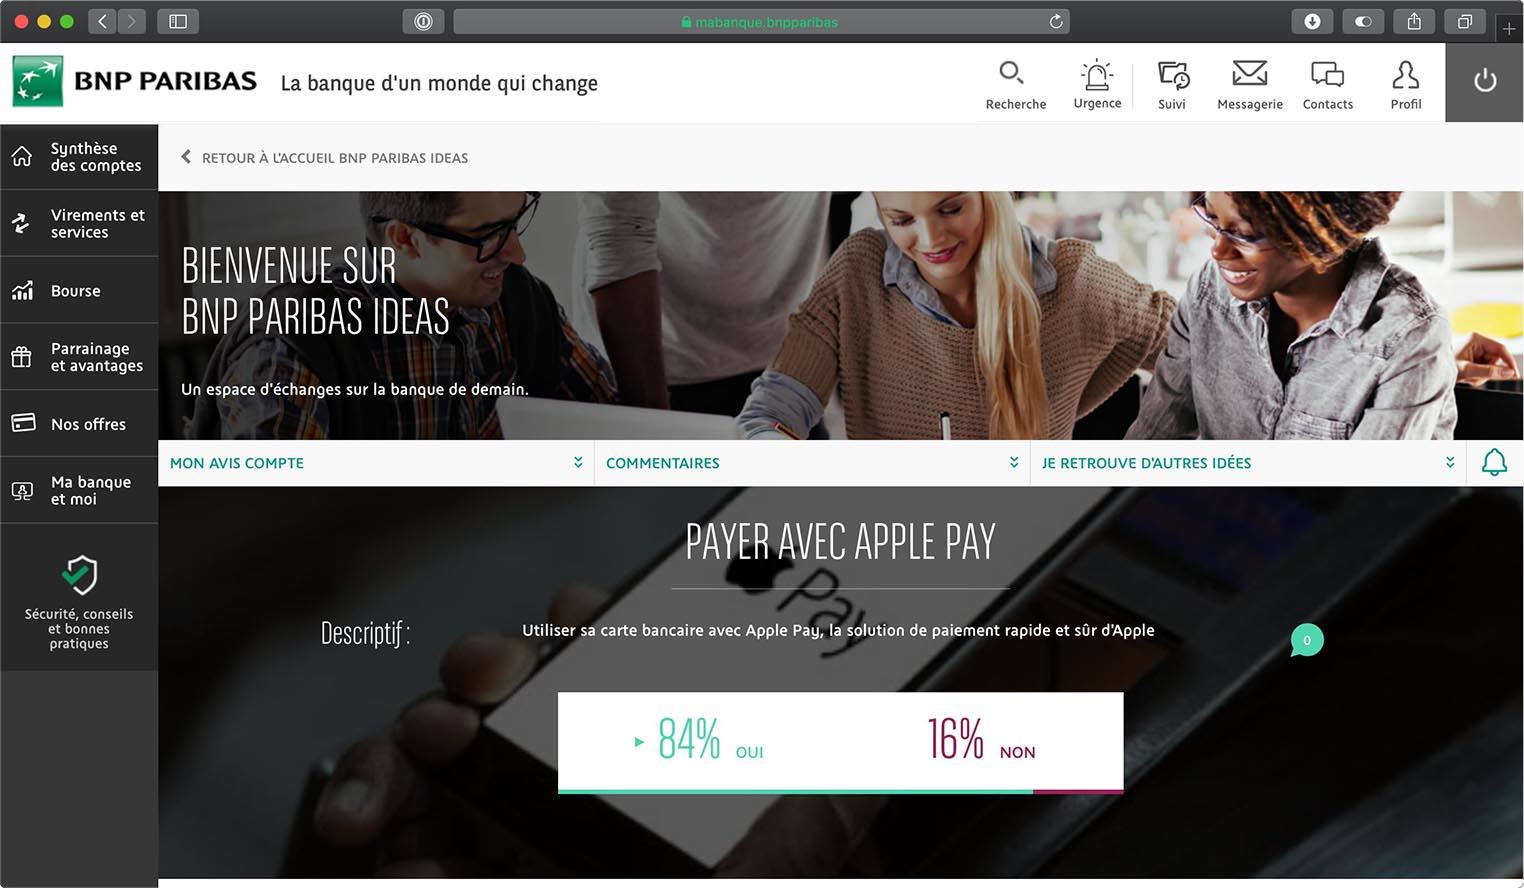 Apple Pay sondage BNP Paribas